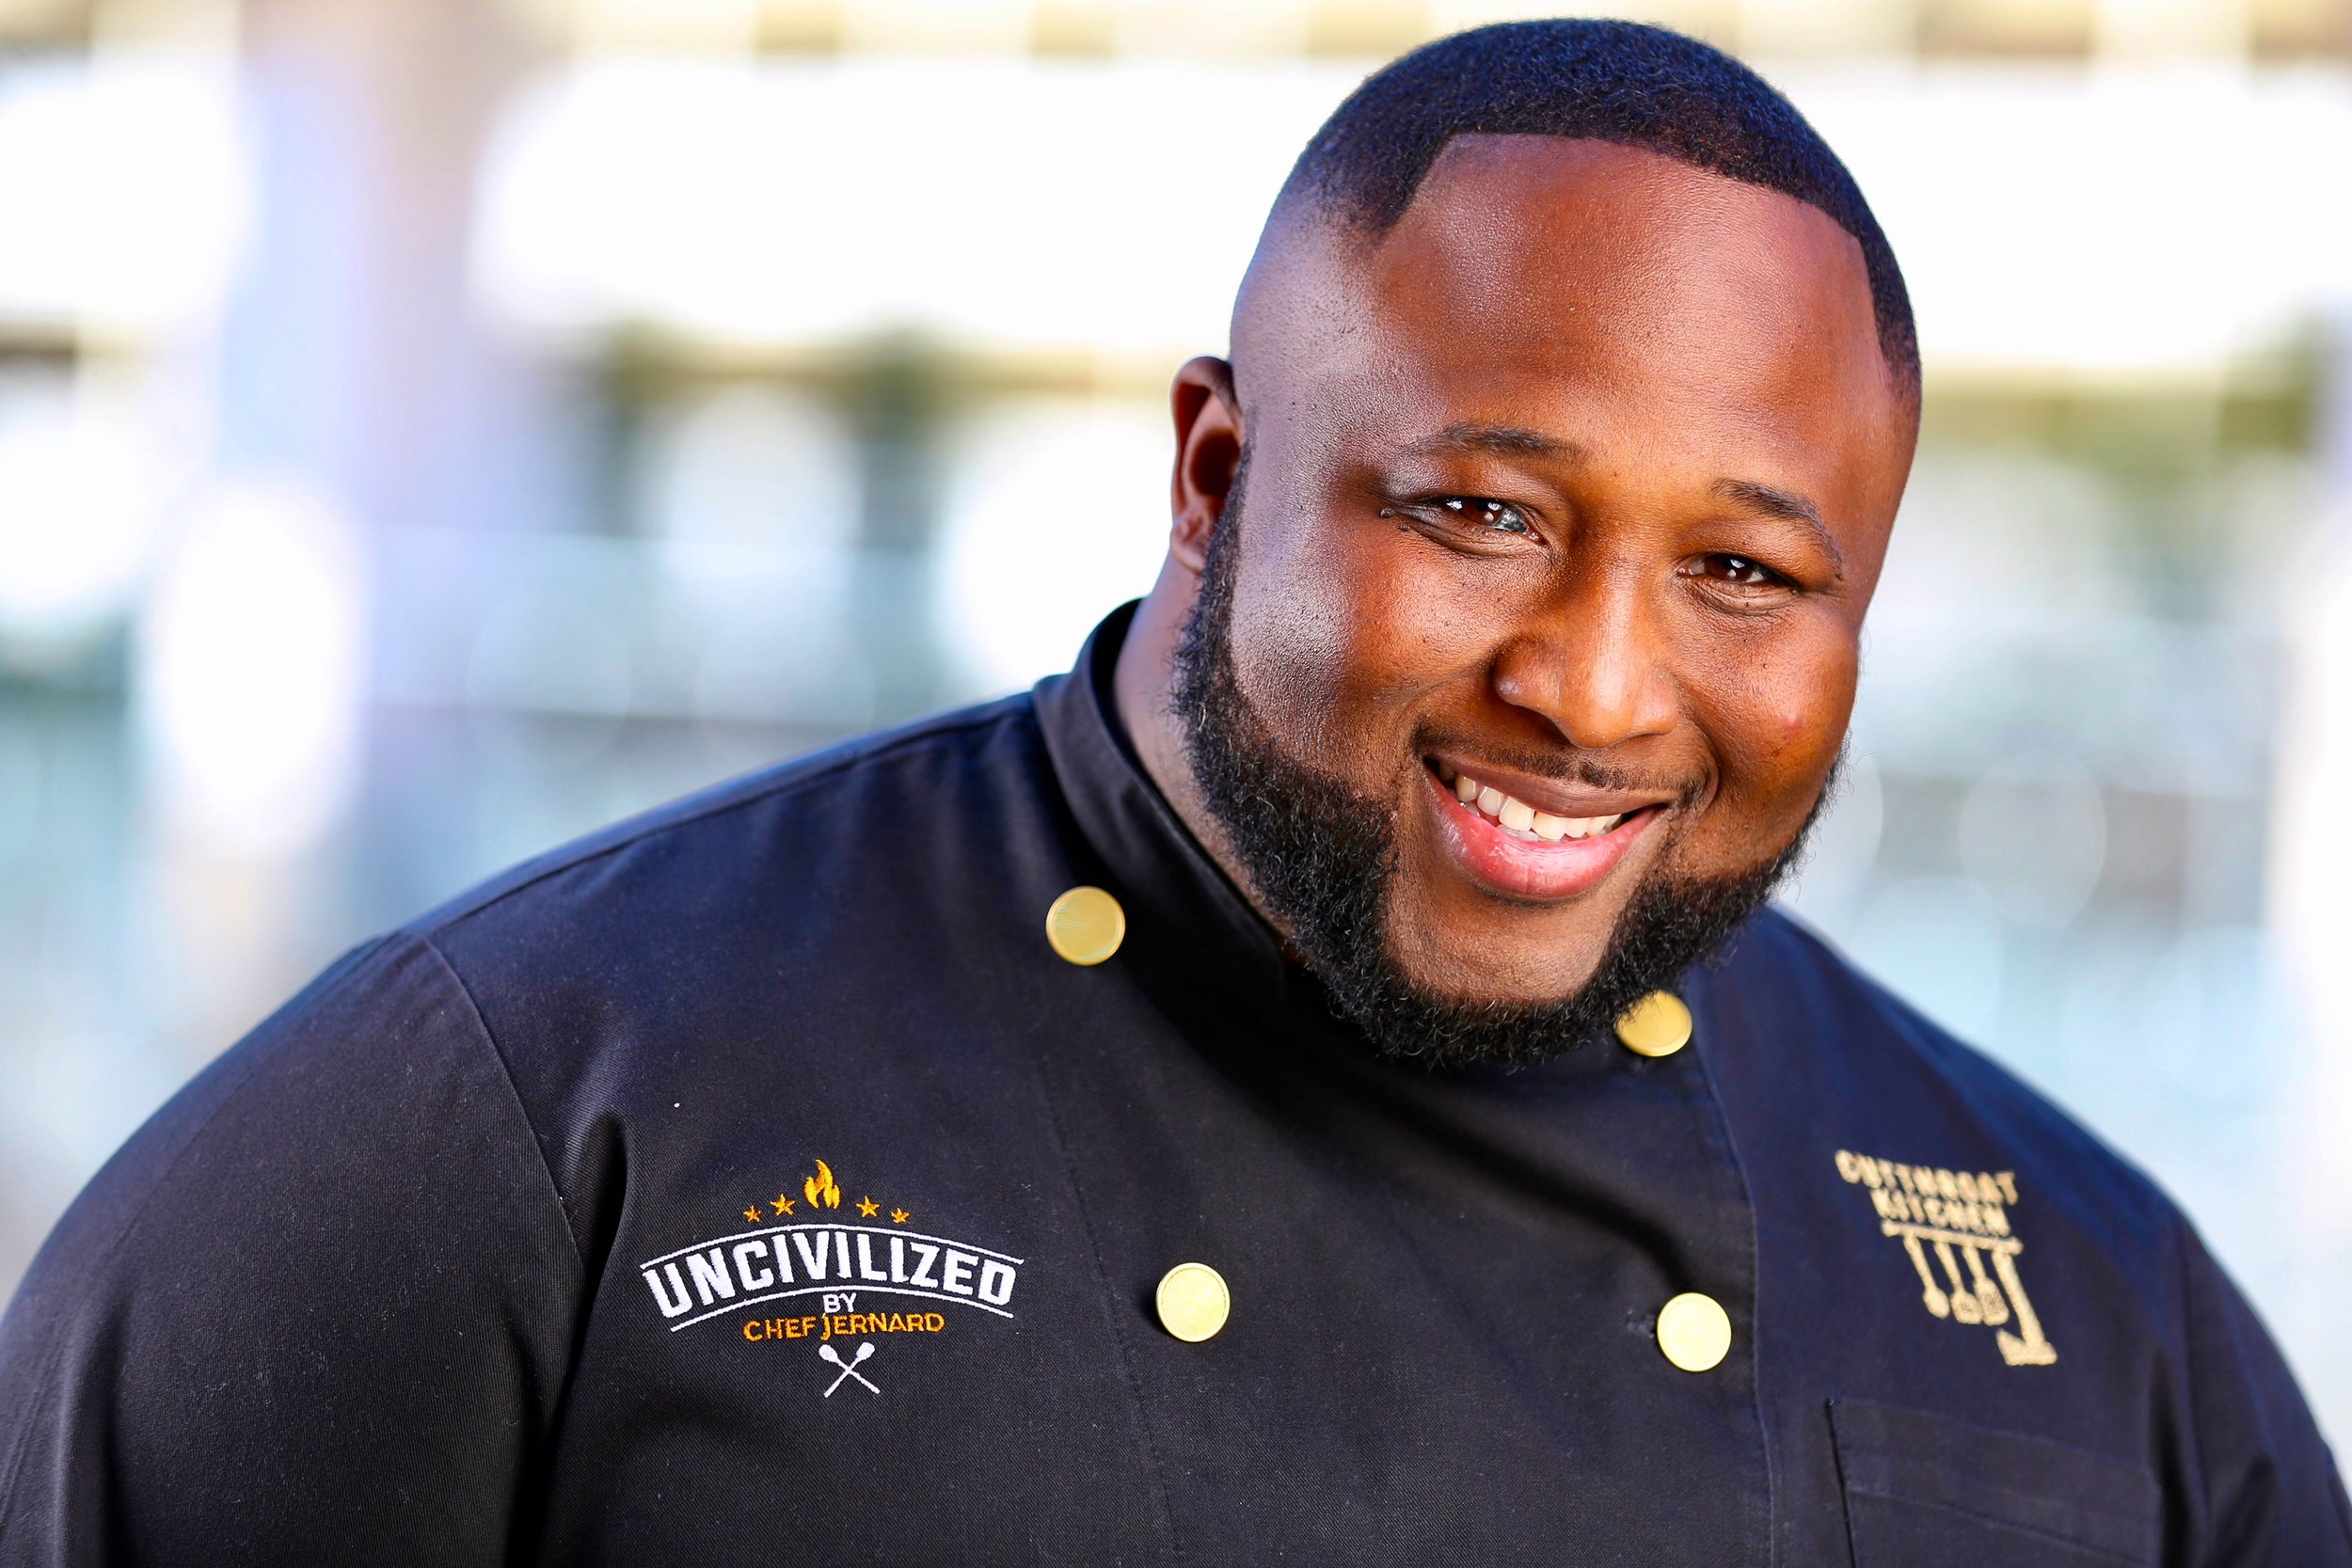 Chef Jernard Wells_Black Chef Jacket.jpg